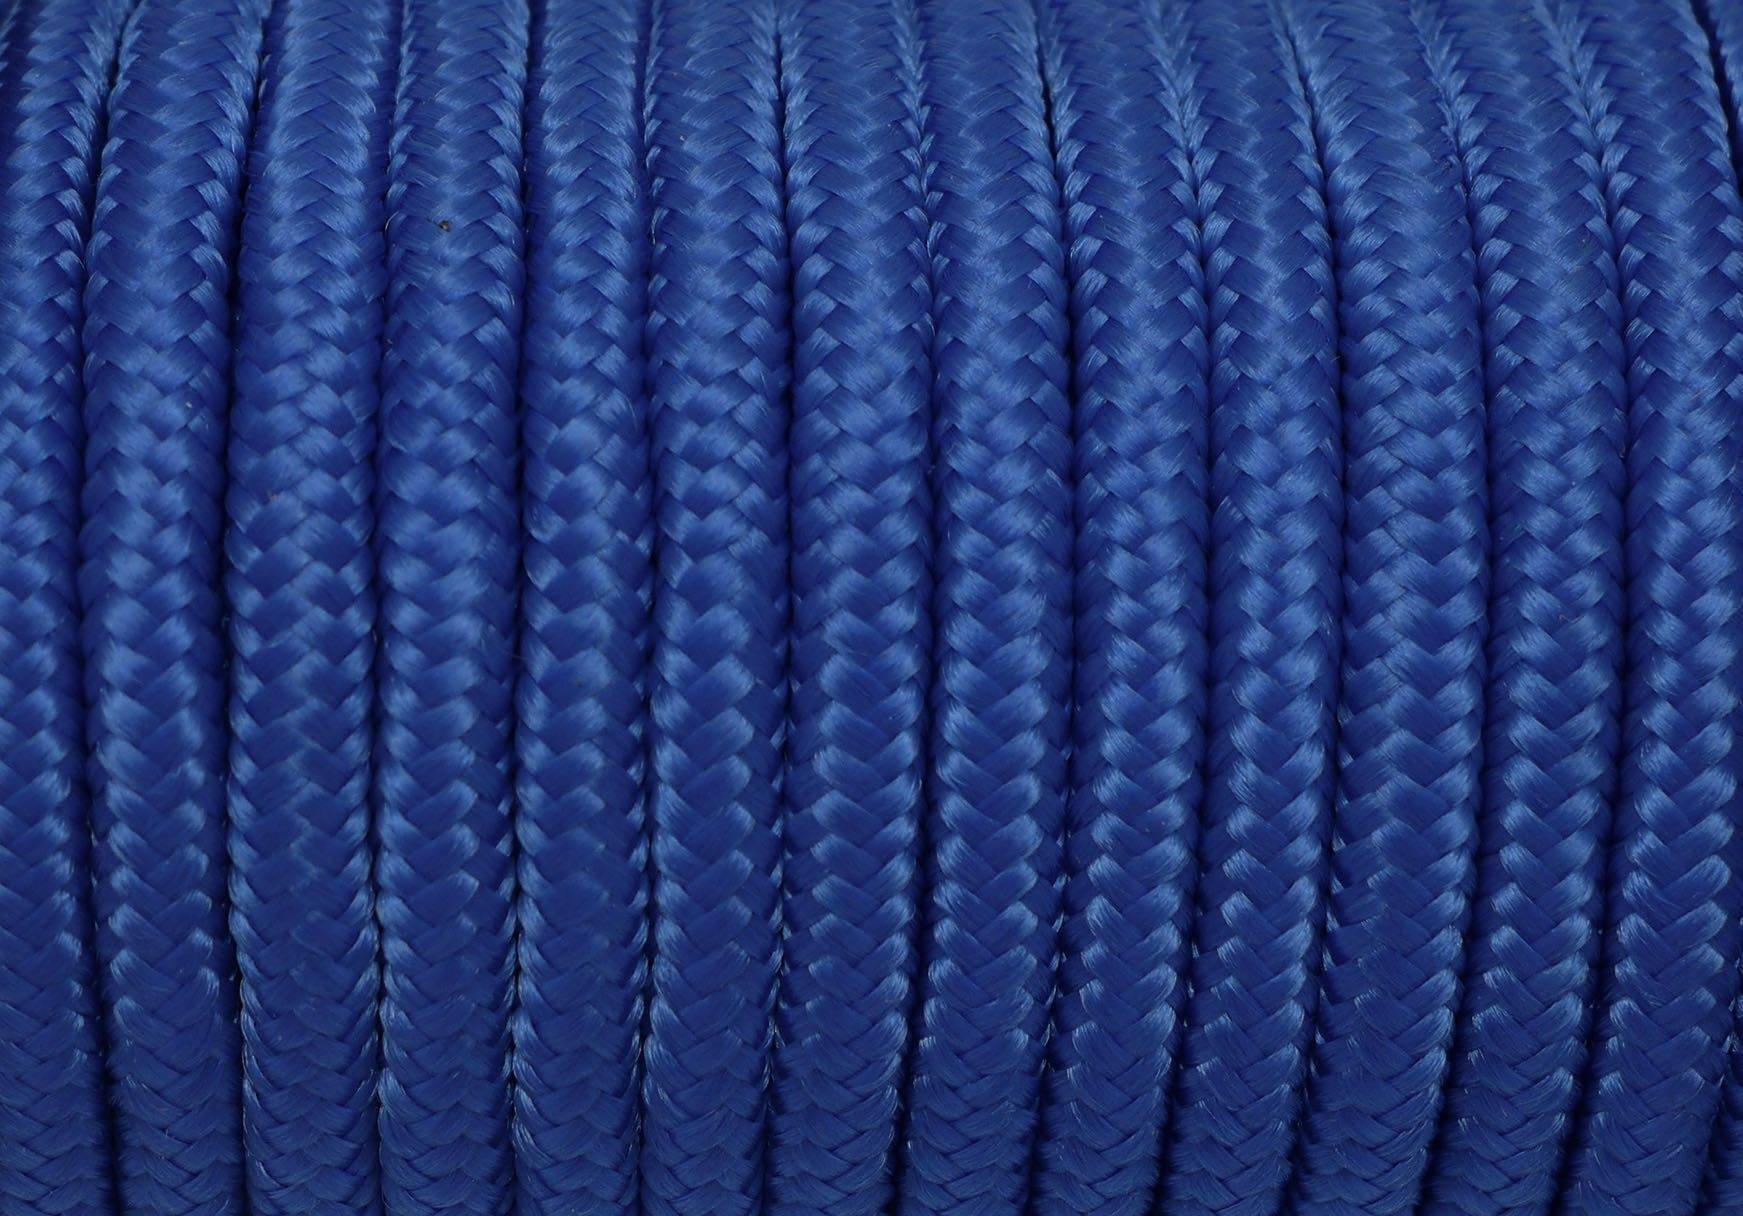 Corde en su/édine 3 couleurs 3 pi/èces de 3 mm de cordon en simili cuir